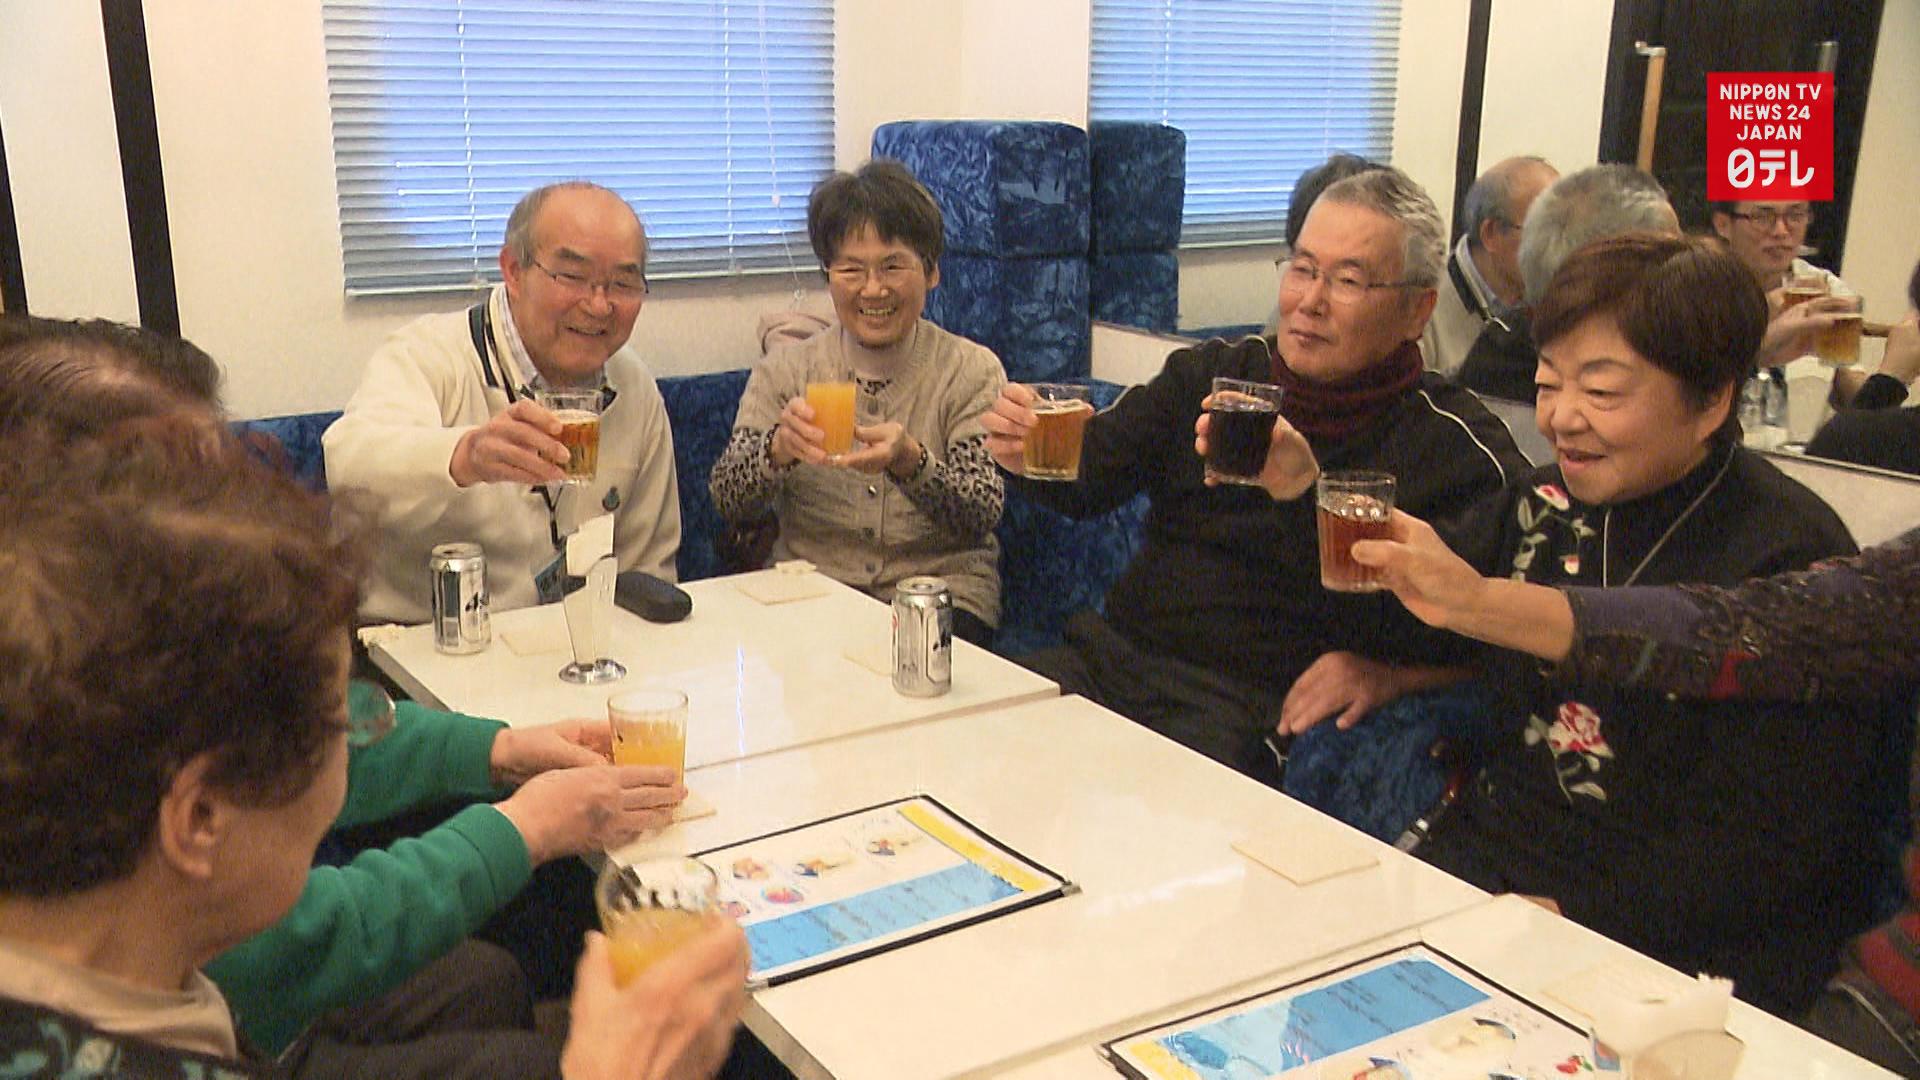 Nightclub for the elderly